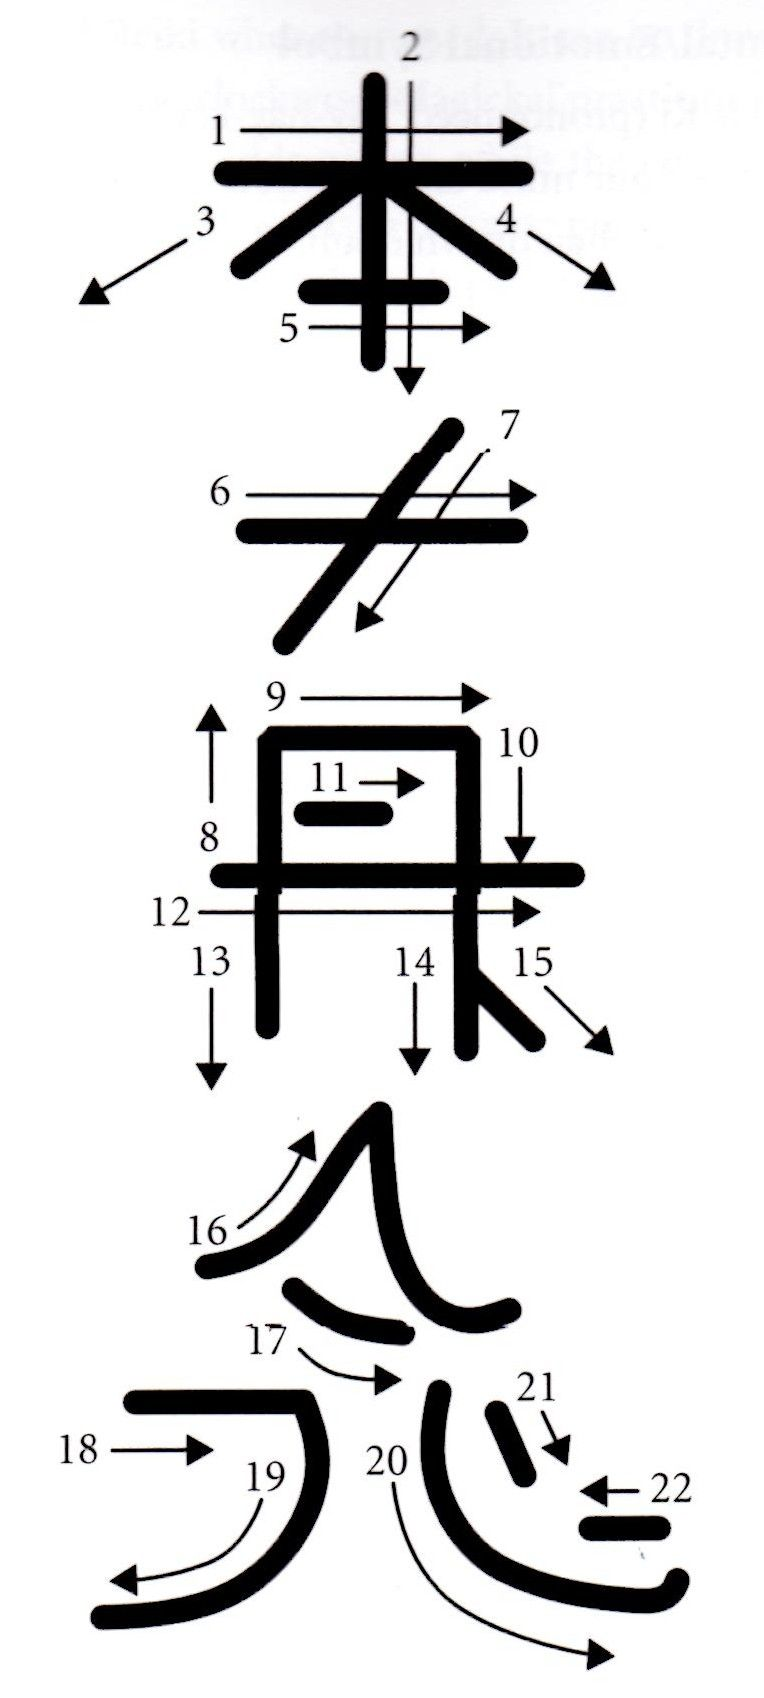 Honshazeshonen distance symbol 61956738 7641698 spirtual ness honshazeshonen distance symbol 61956738 7641698 reikidistancetherapylong distance relationships biocorpaavc Gallery